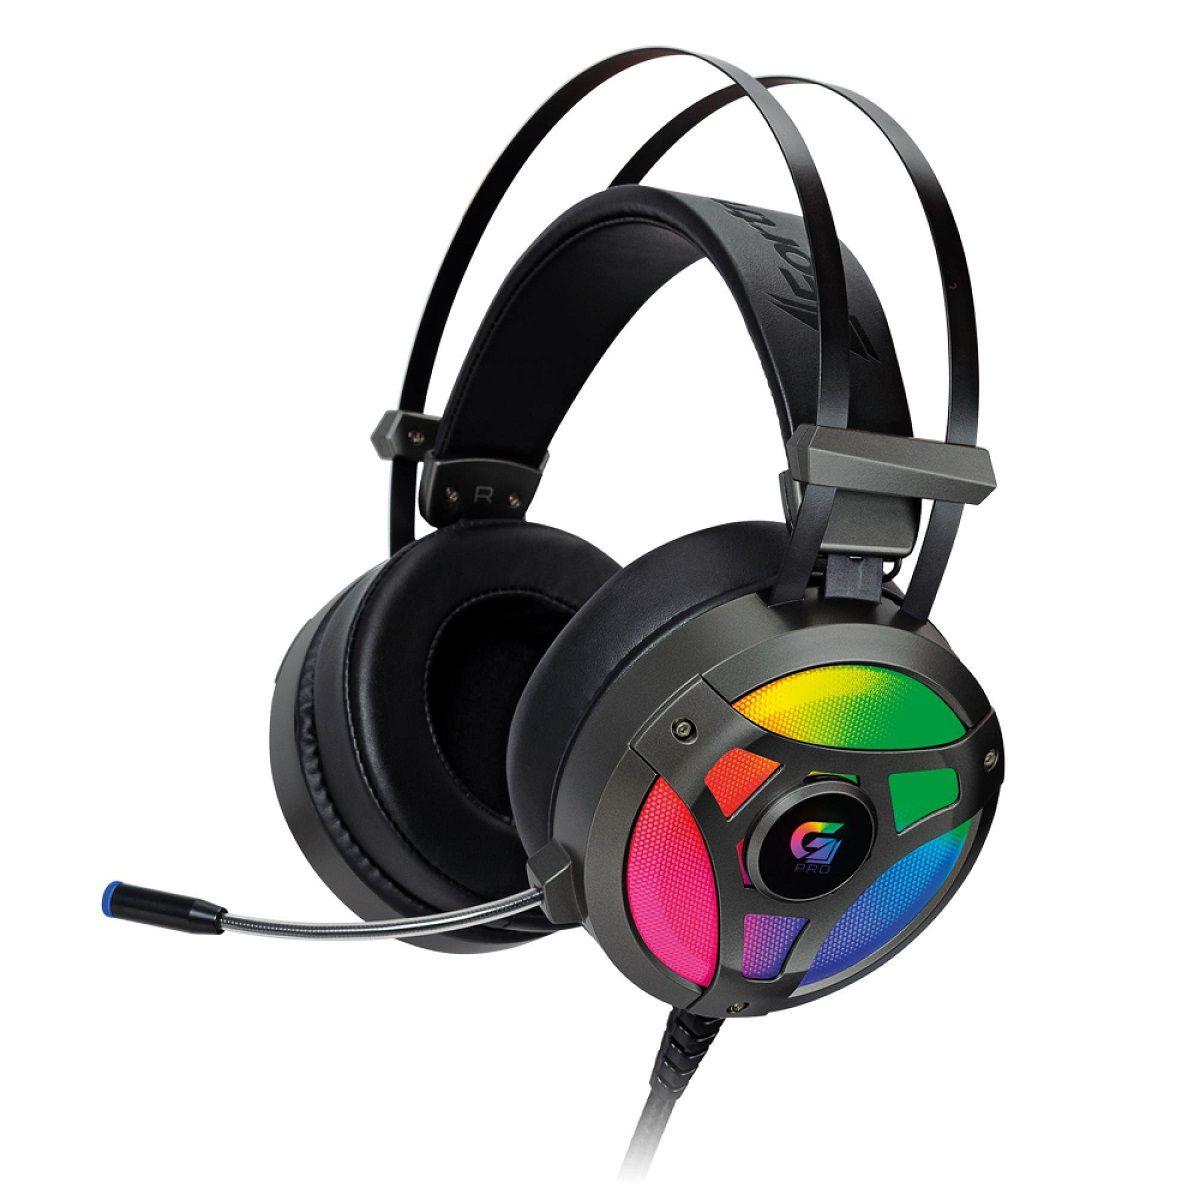 Fone De Ouvido Headset Gamer 7.1 Surround Fortrek G Pro LED RGB H1 Plus USB